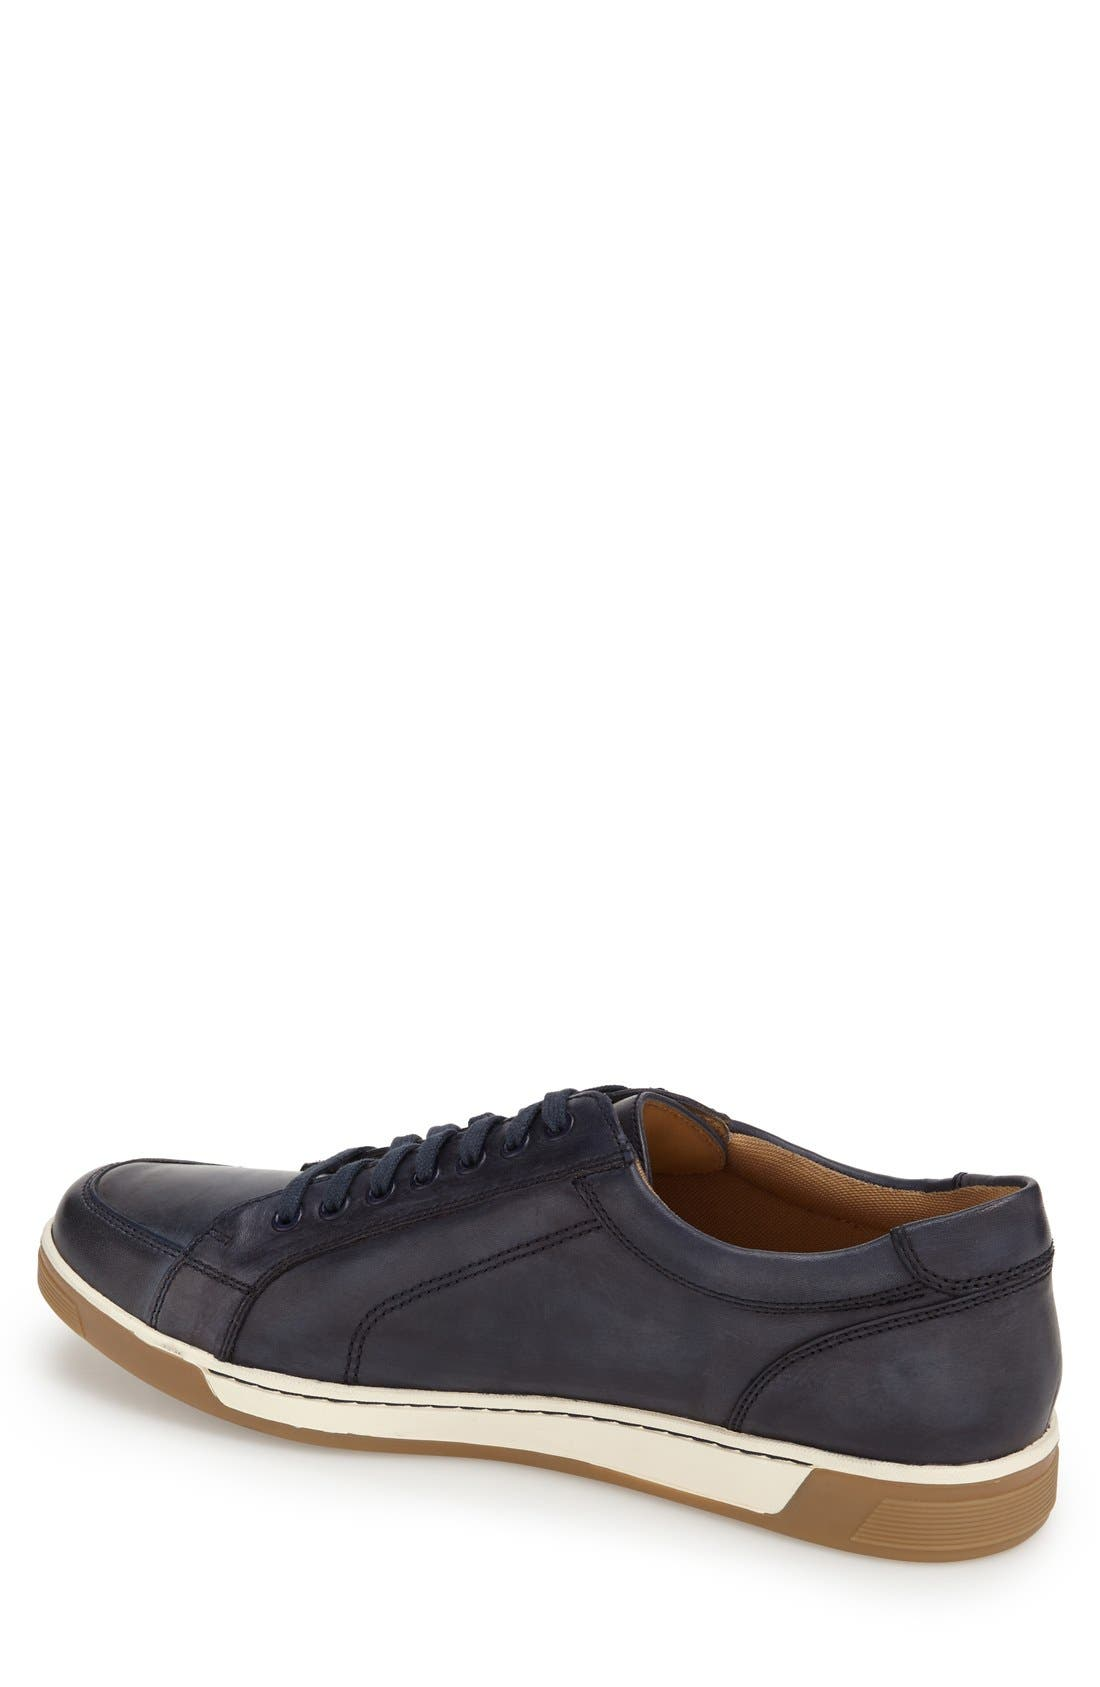 'Vartan Sport Oxford' Sneaker,                             Alternate thumbnail 44, color,